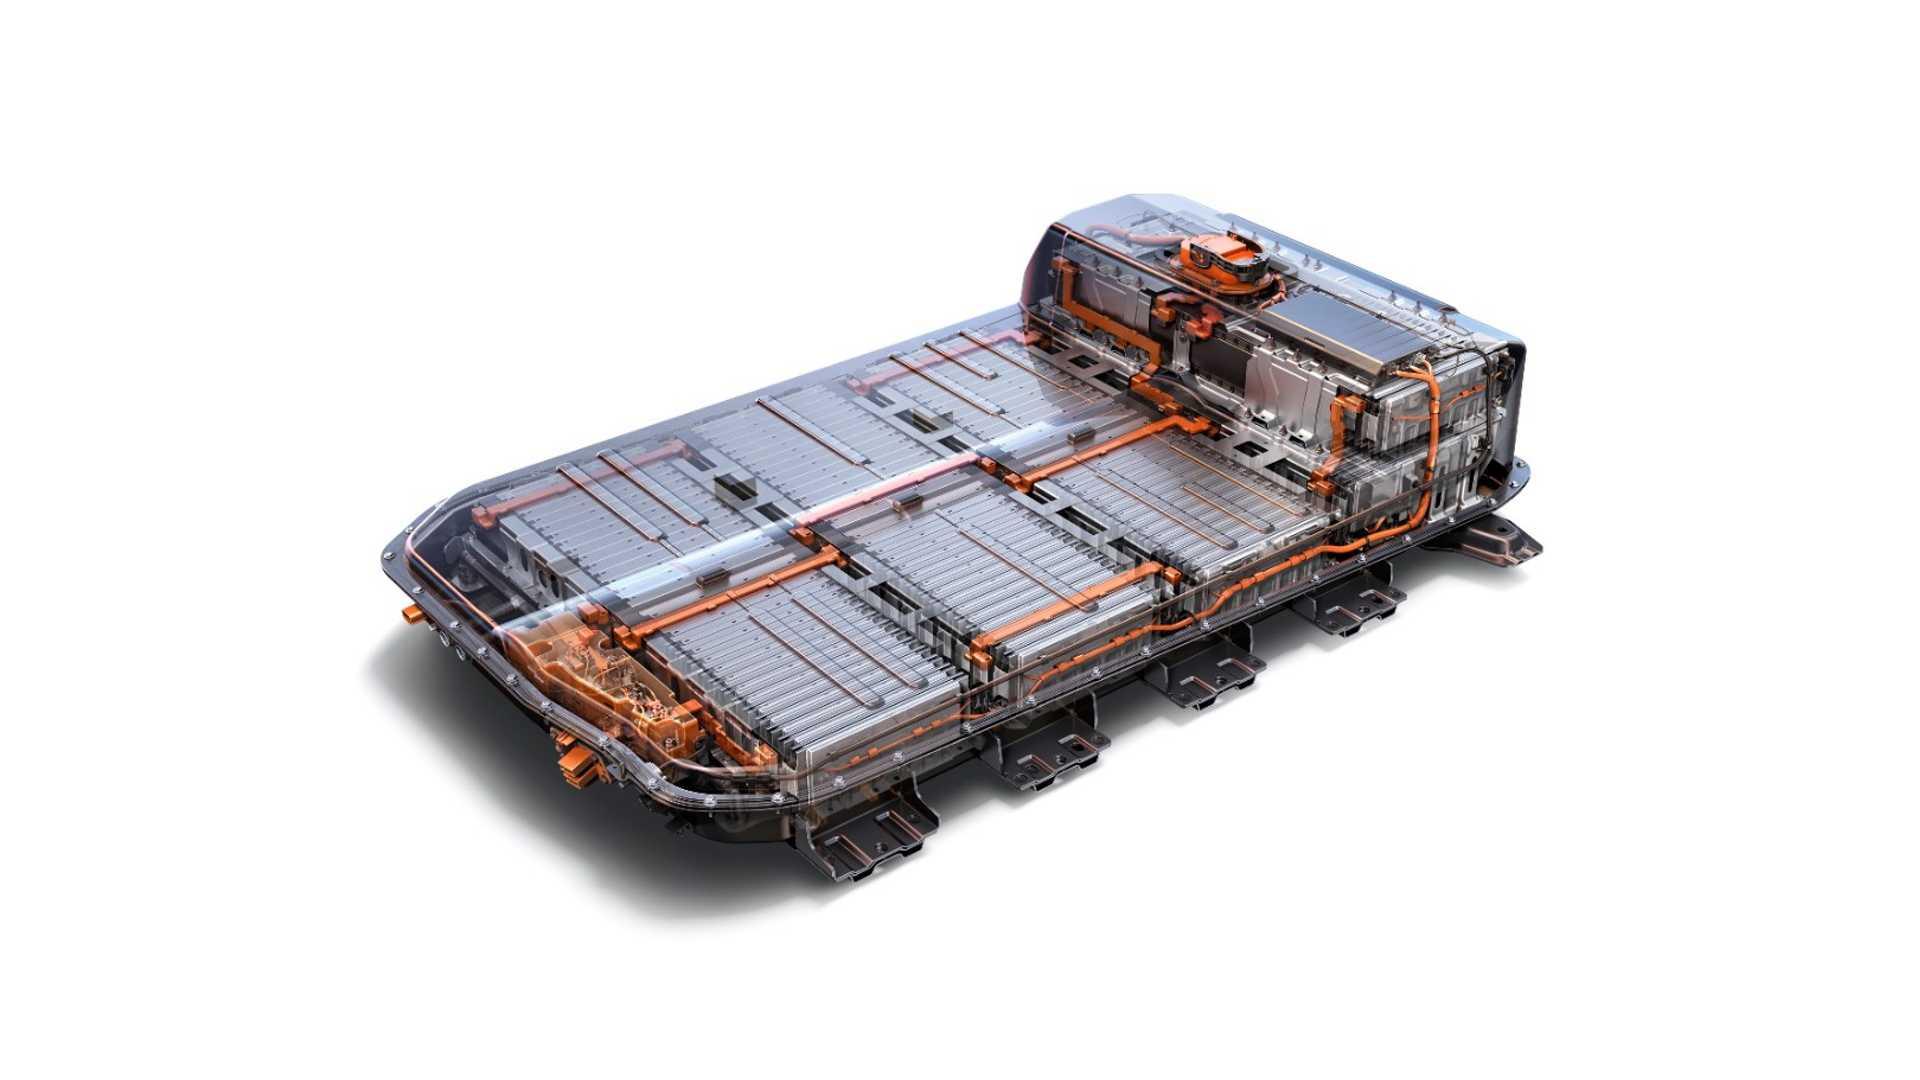 chevrolet-bolt-ev-battery-cutaway-60-kwh.jpg